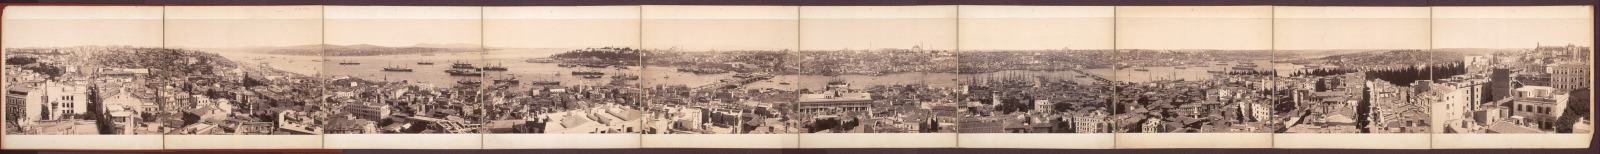 Galata_Kulesi_'nden_panorama